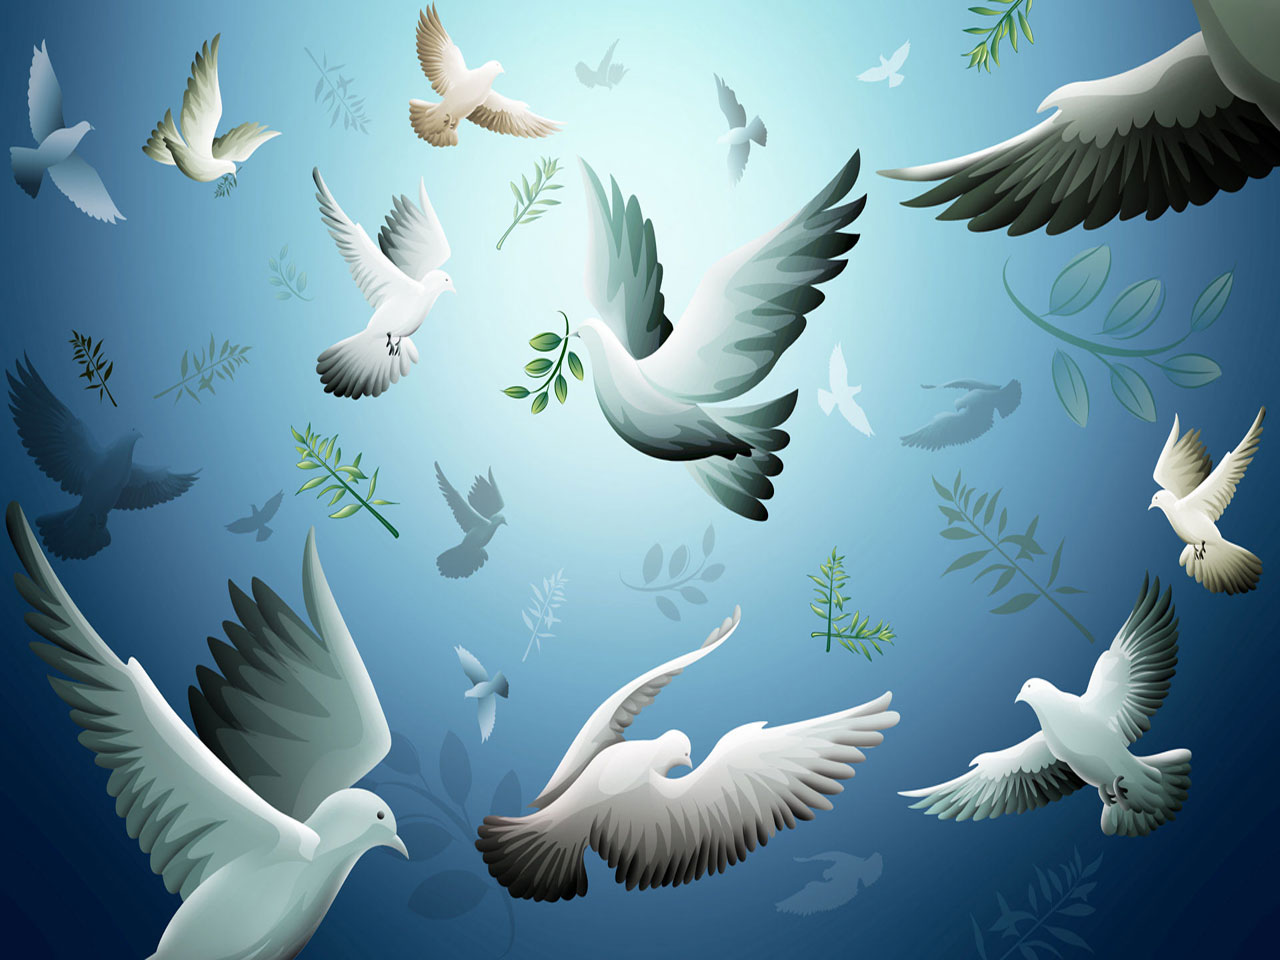 http://4.bp.blogspot.com/-SNLryul_mKk/UA5skYlepcI/AAAAAAAAAq0/3lauv27uSpE/s1600/animated-pigeons-wallpapers.jpg